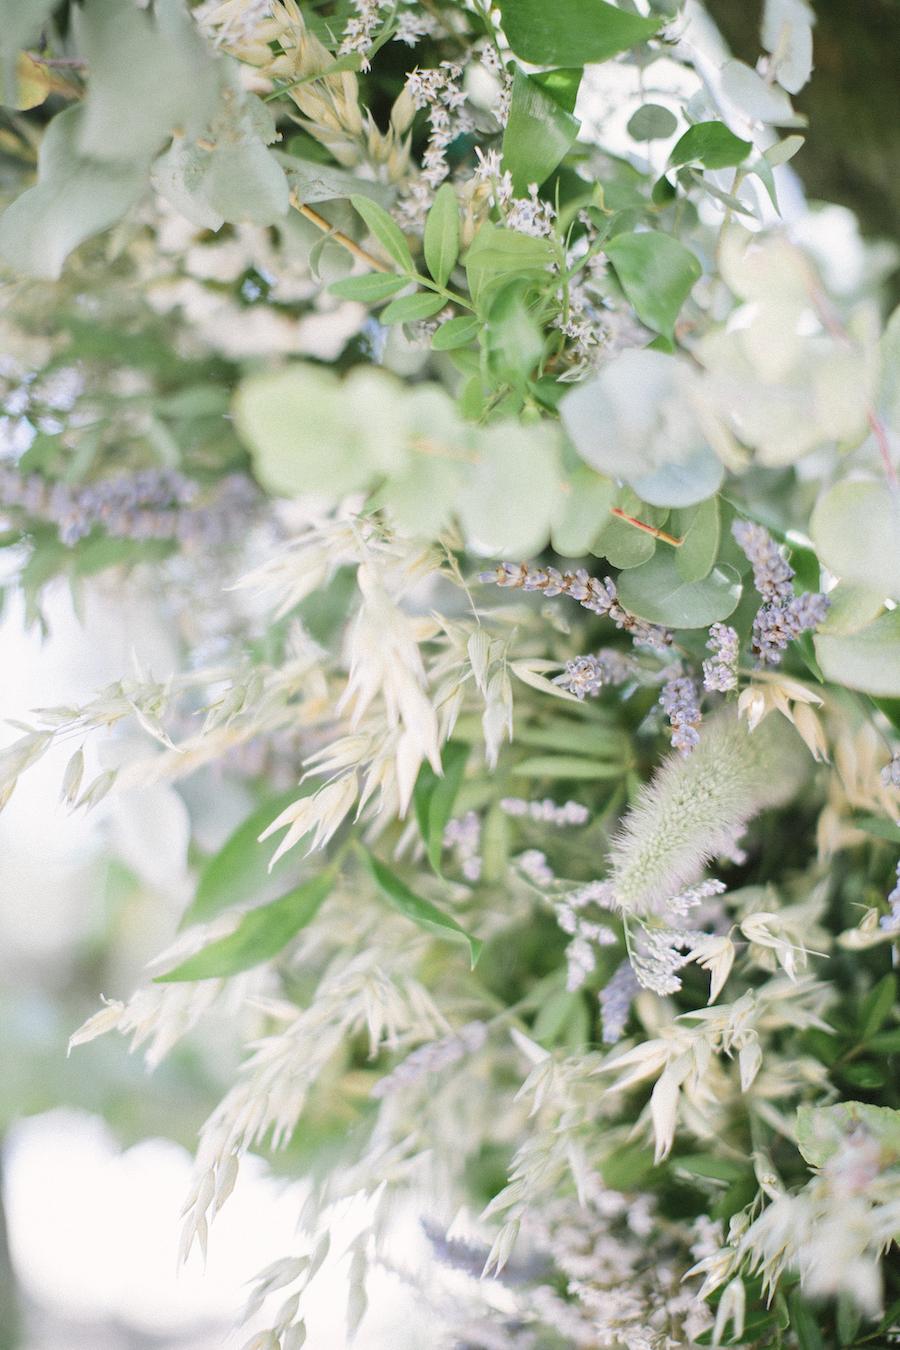 saya-photography-rustic-french-wedding-provence-domaines-de-patras-12.jpg